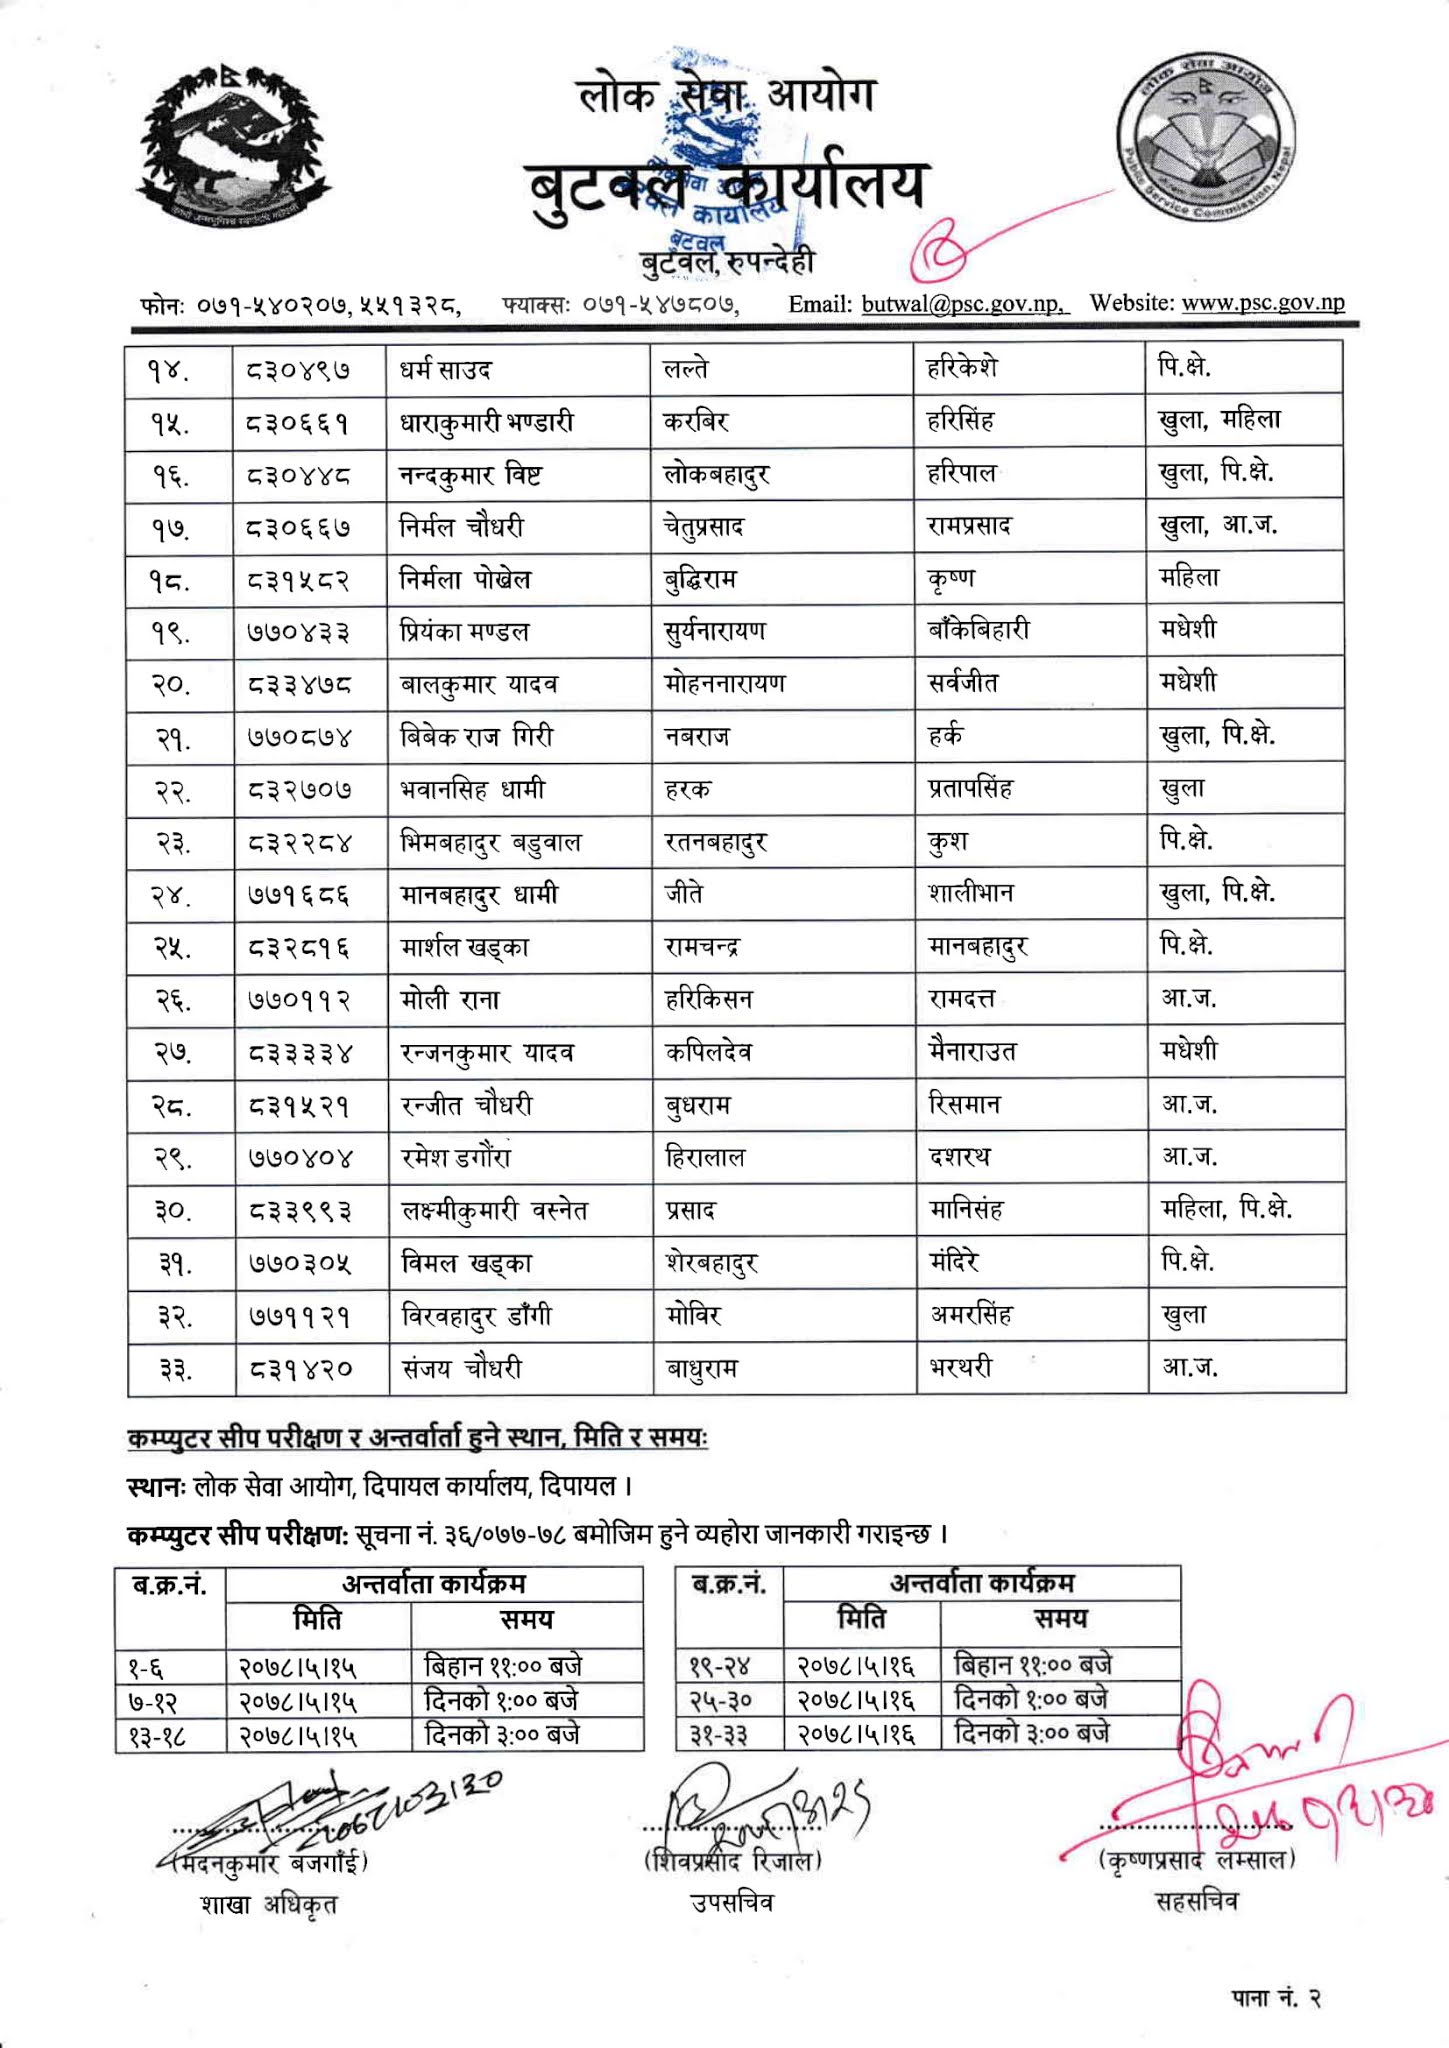 NASU Admin - Dipayal Lok Sewa Aayog Written Exam Result & Exam Schedule